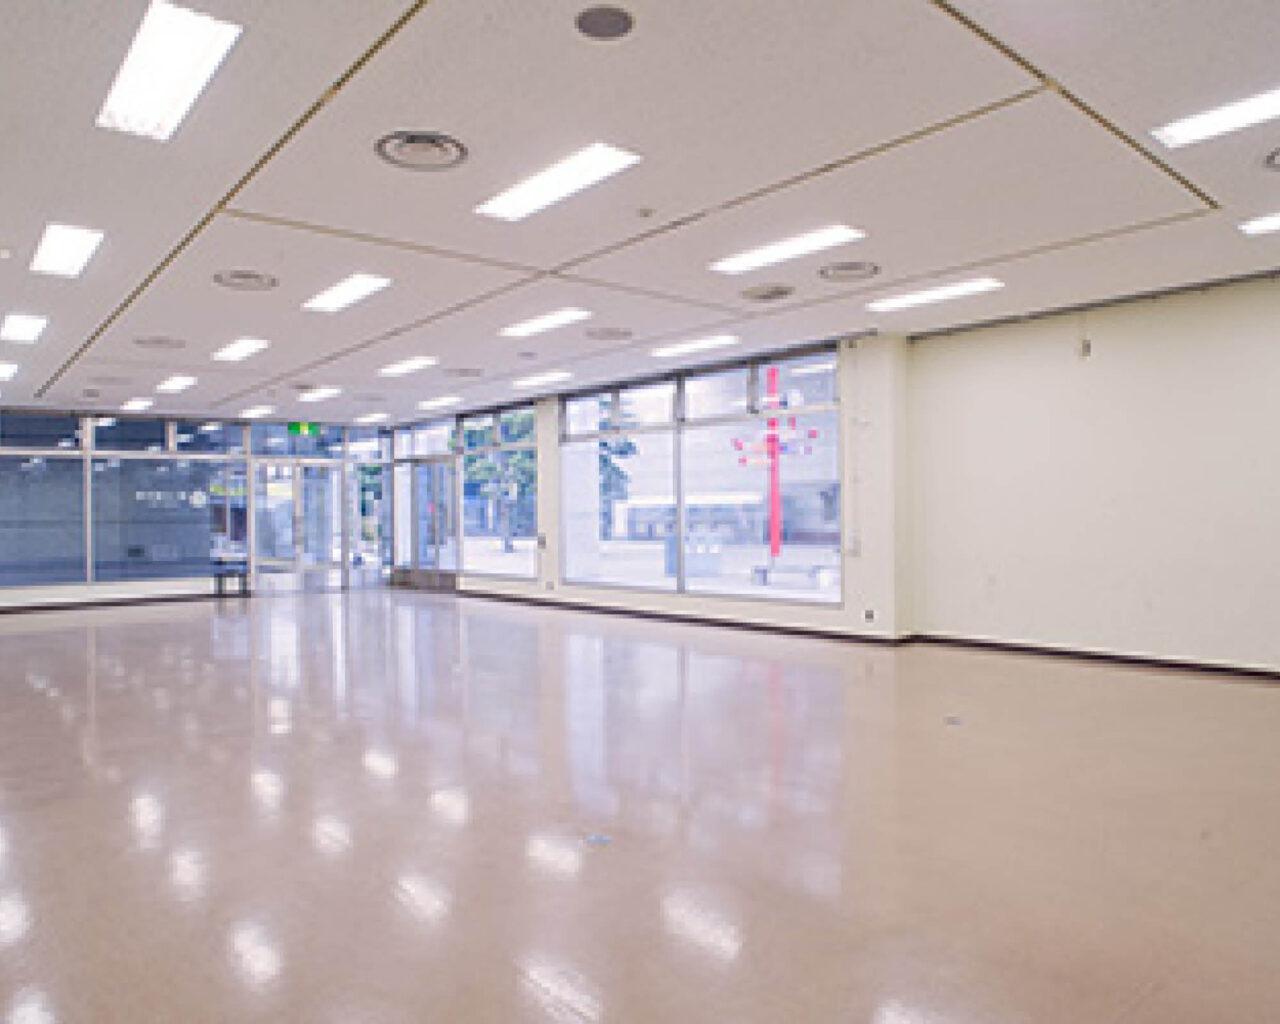 https://www.shizuoka-cb.com/wp-content/uploads/2021/03/photo-venues14-1280x1024.jpg